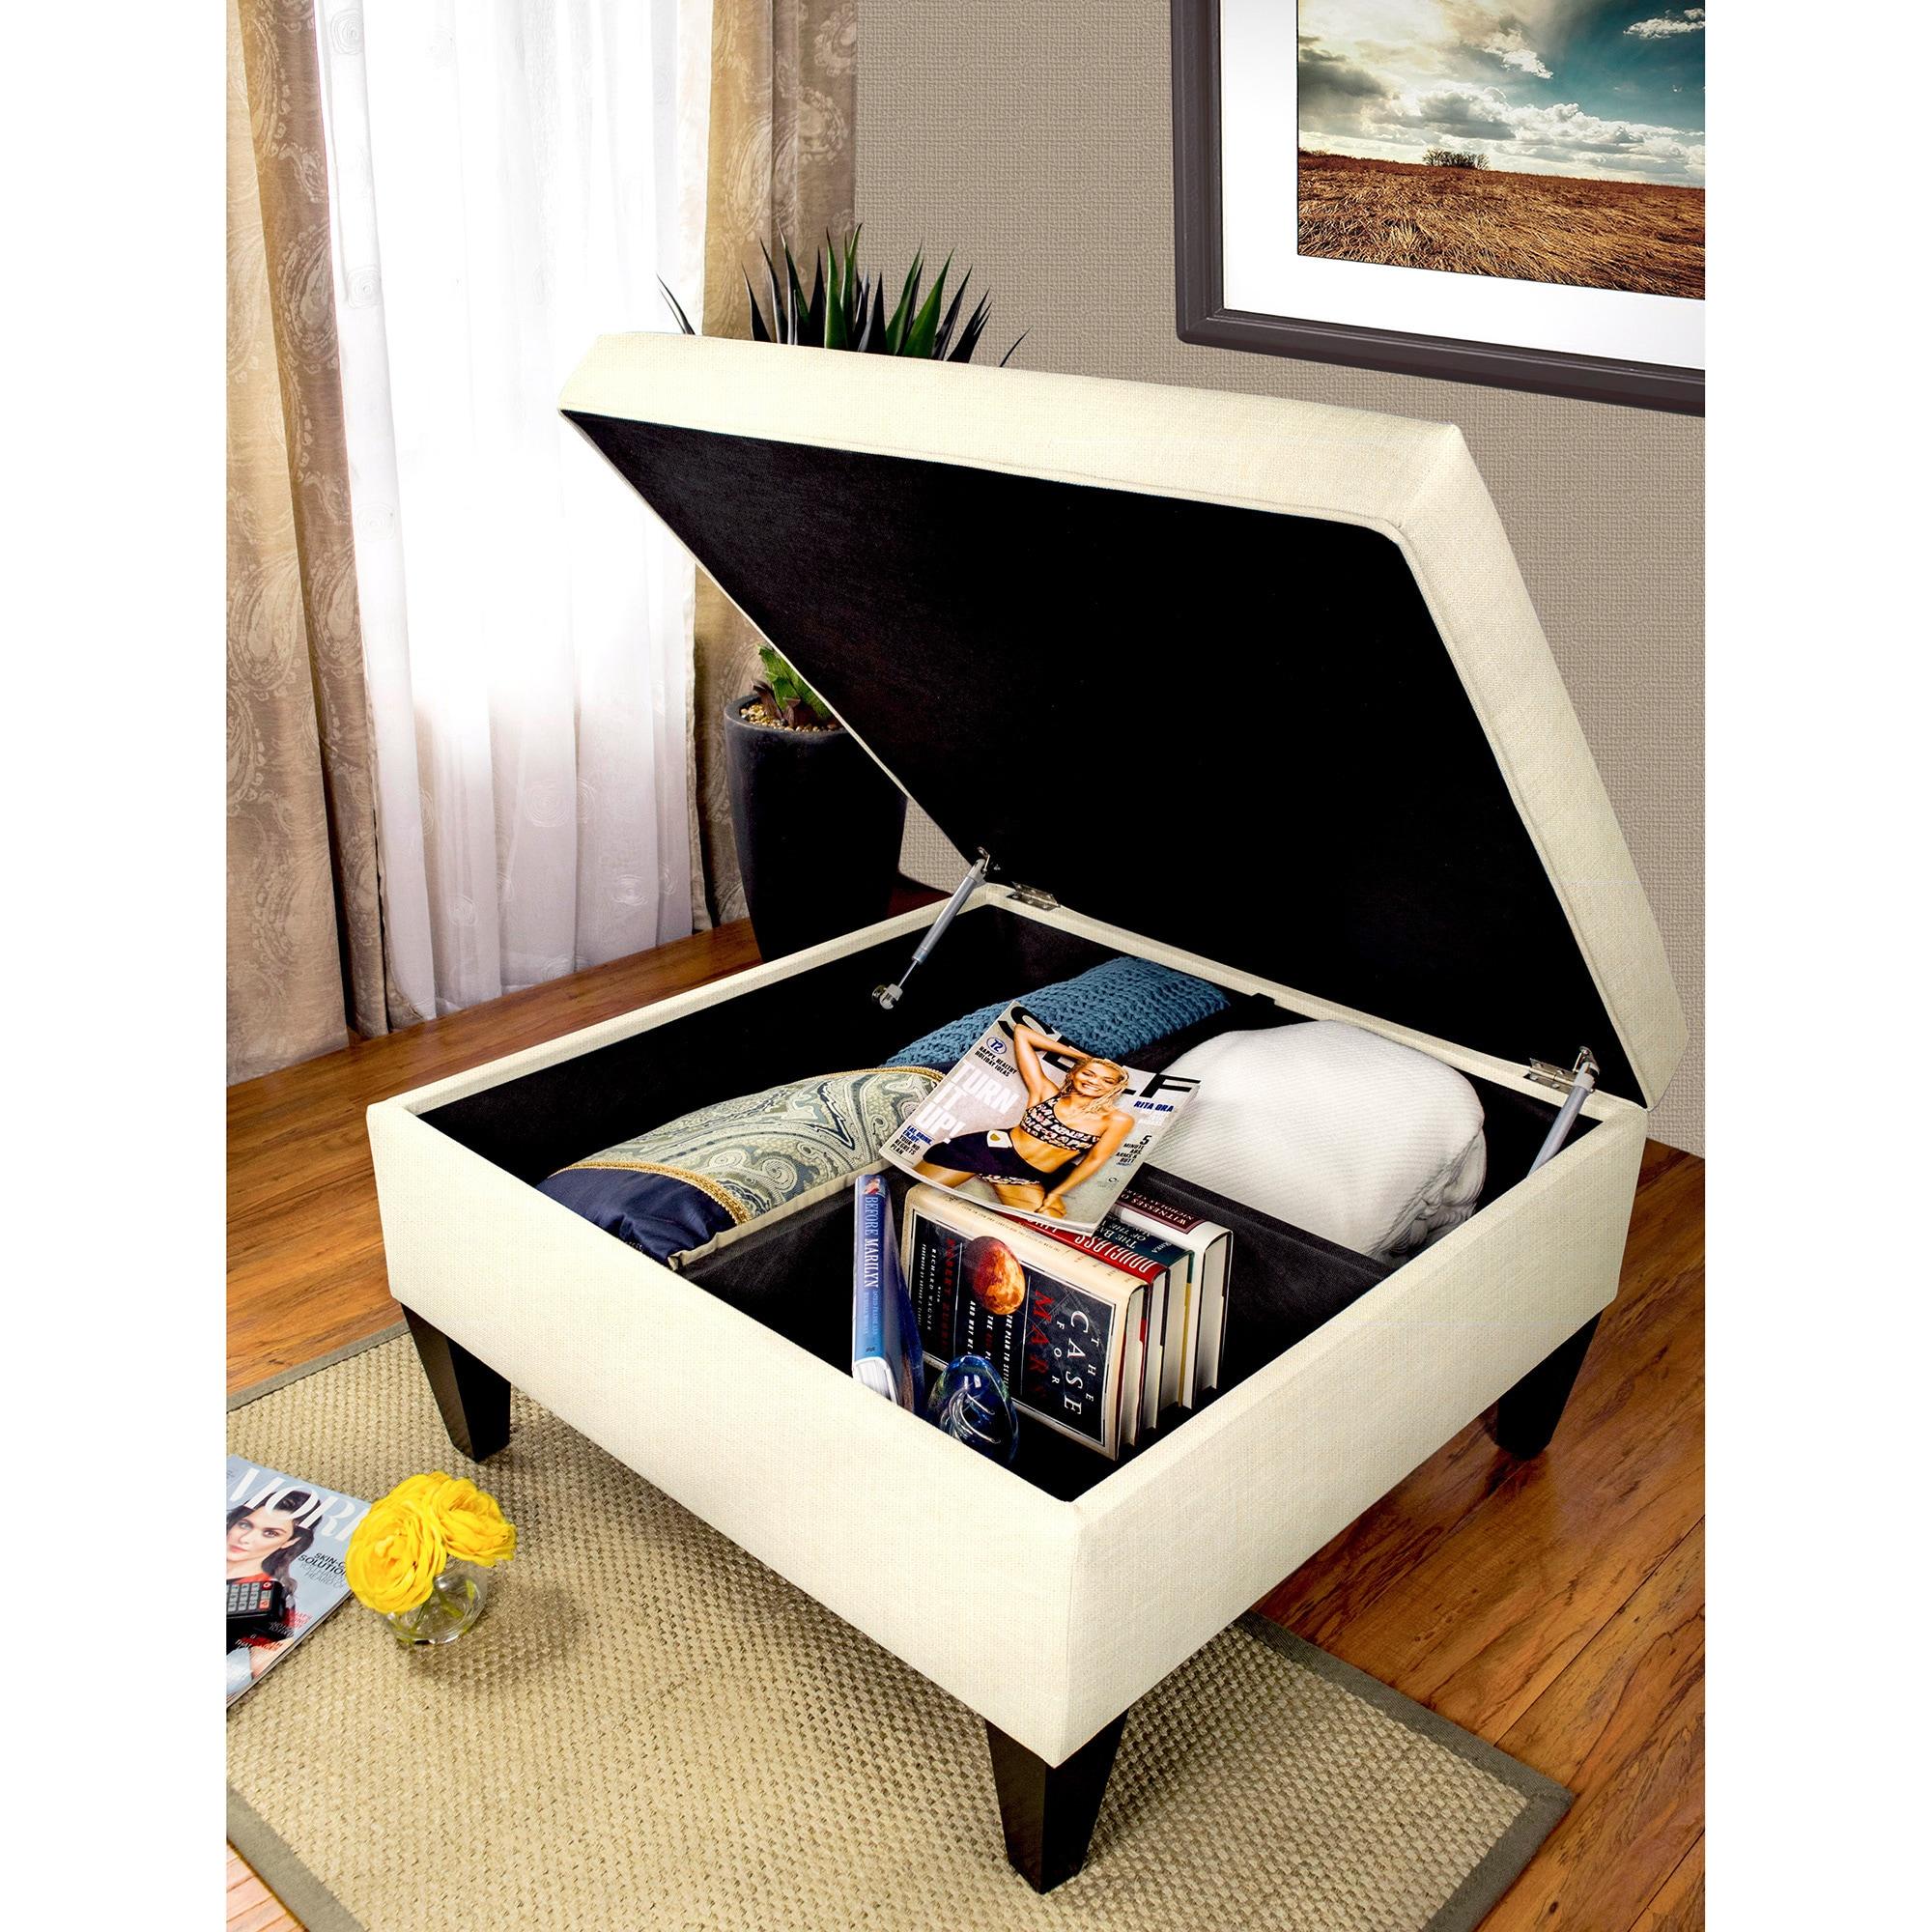 MJL Furniture Manhattan Allure Upholstered Organizational...